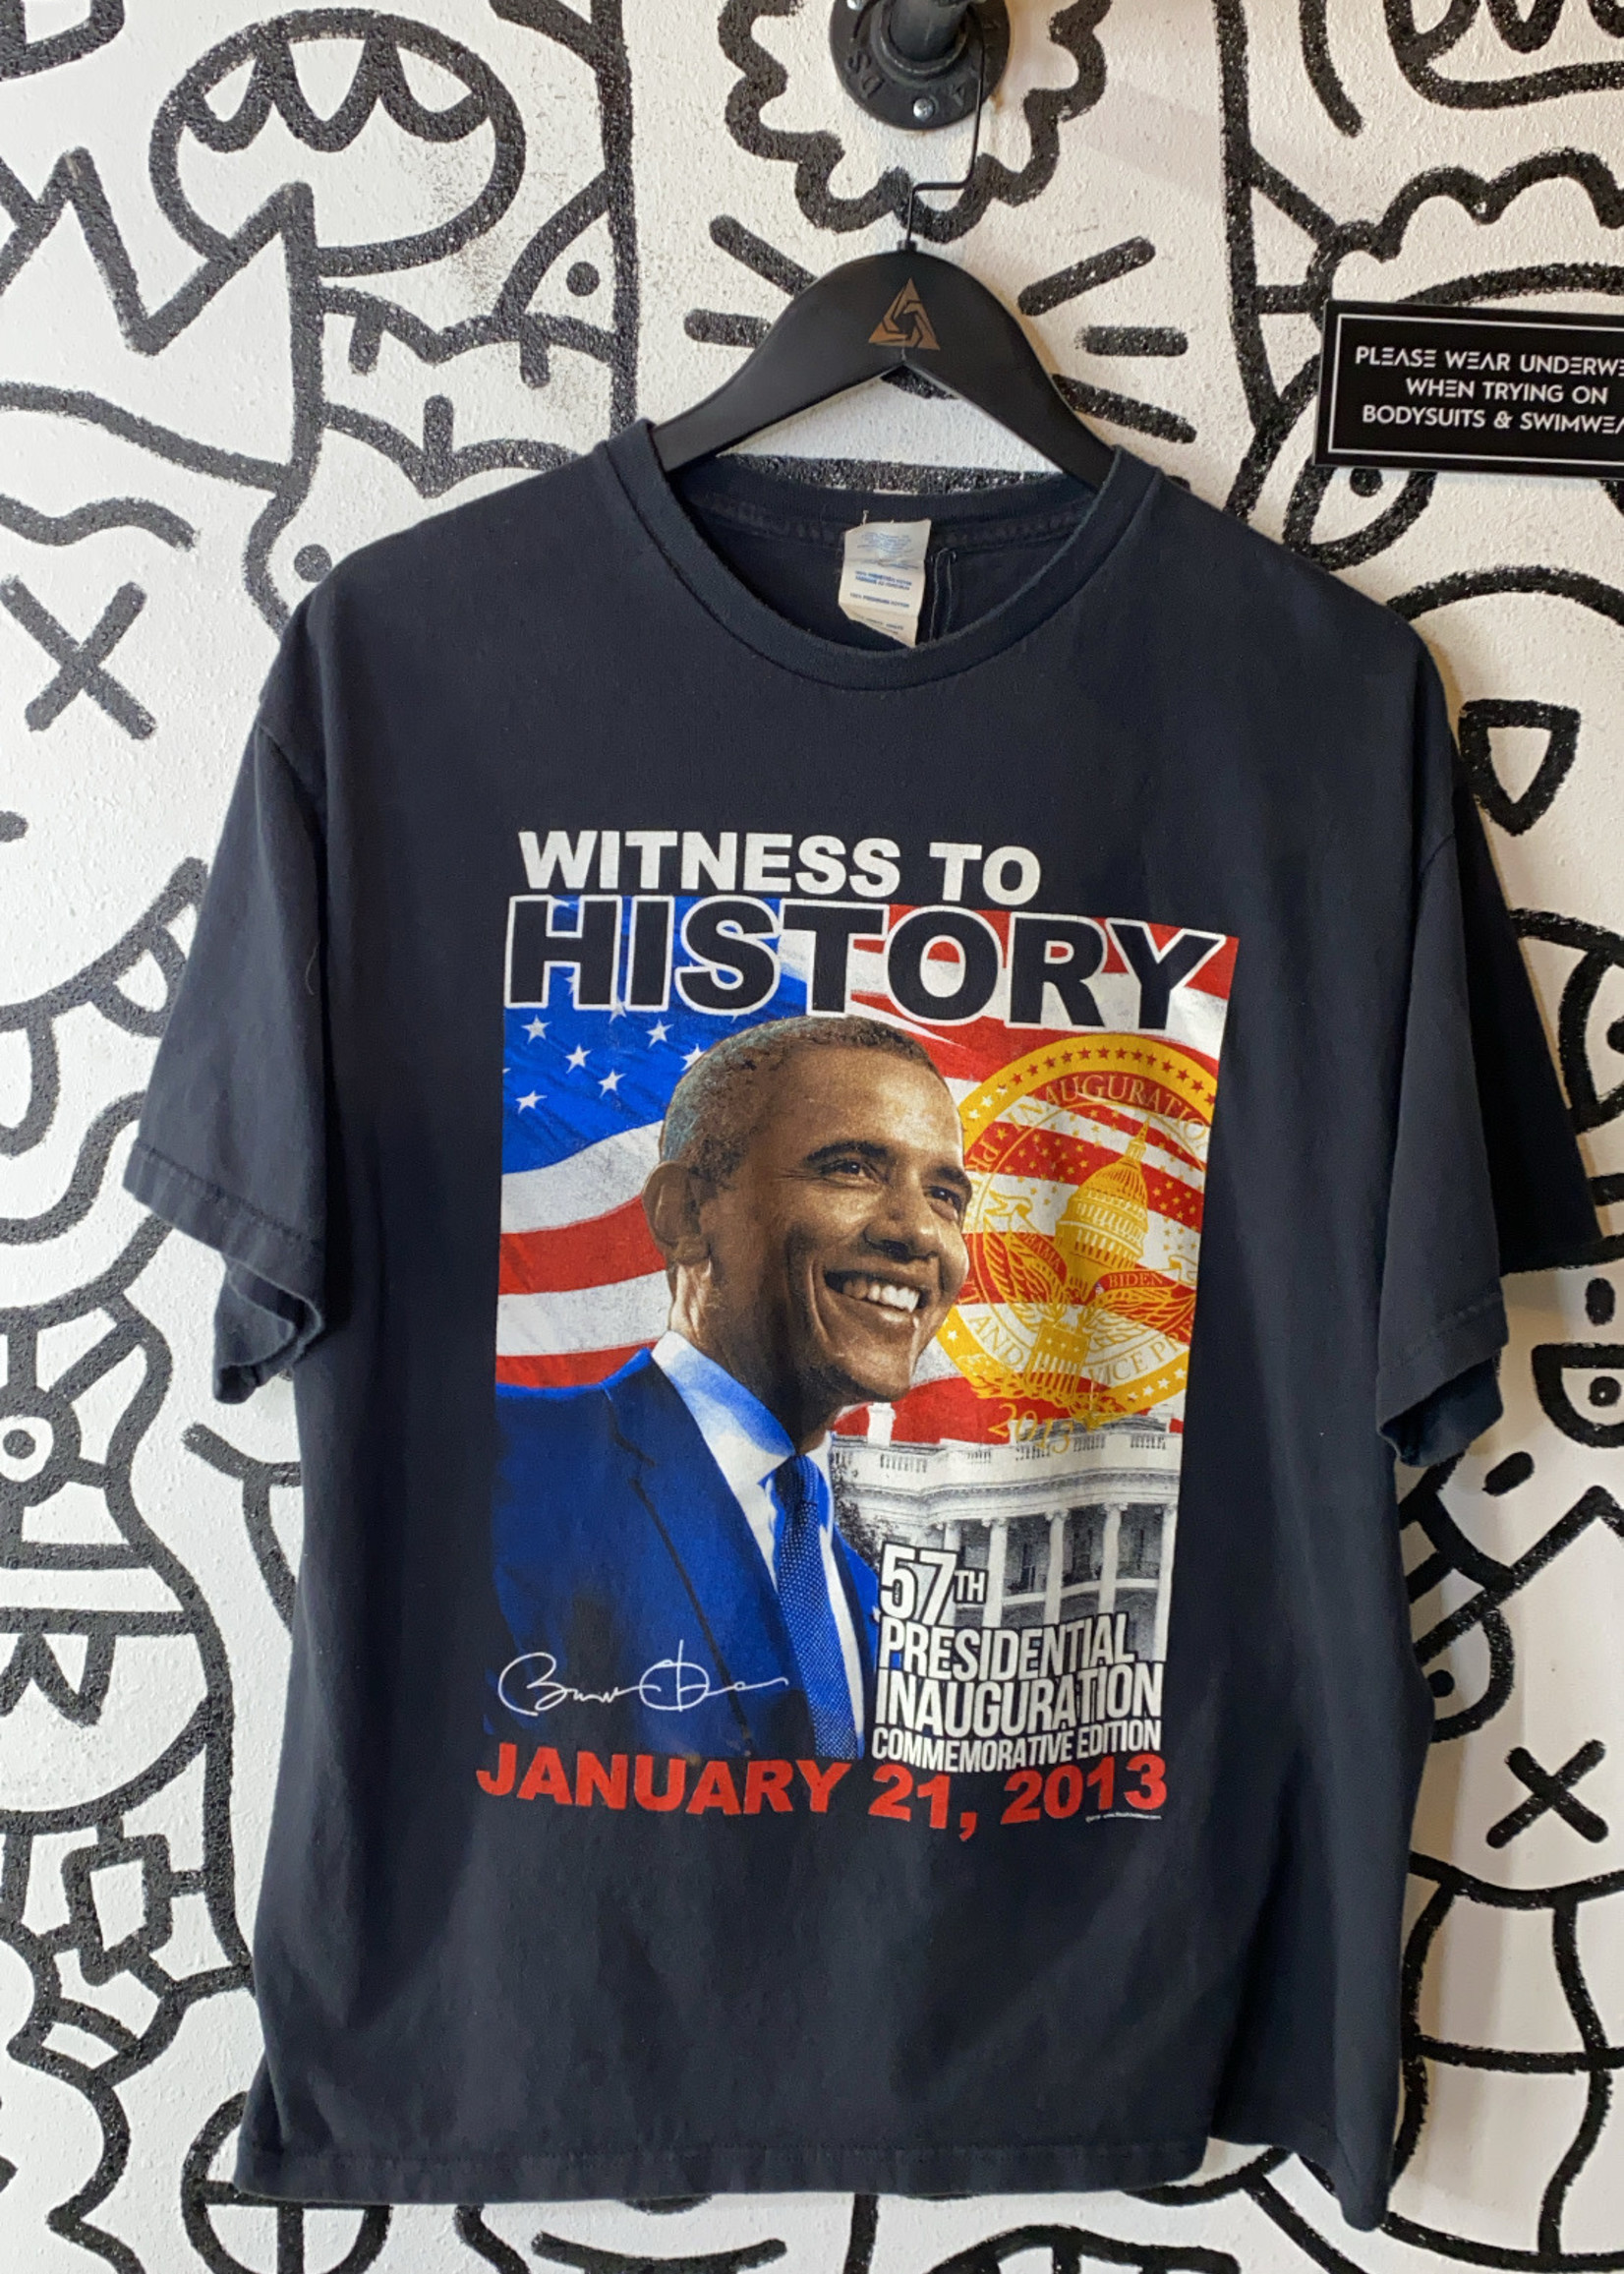 Obama witness to history 2013 black tee XL